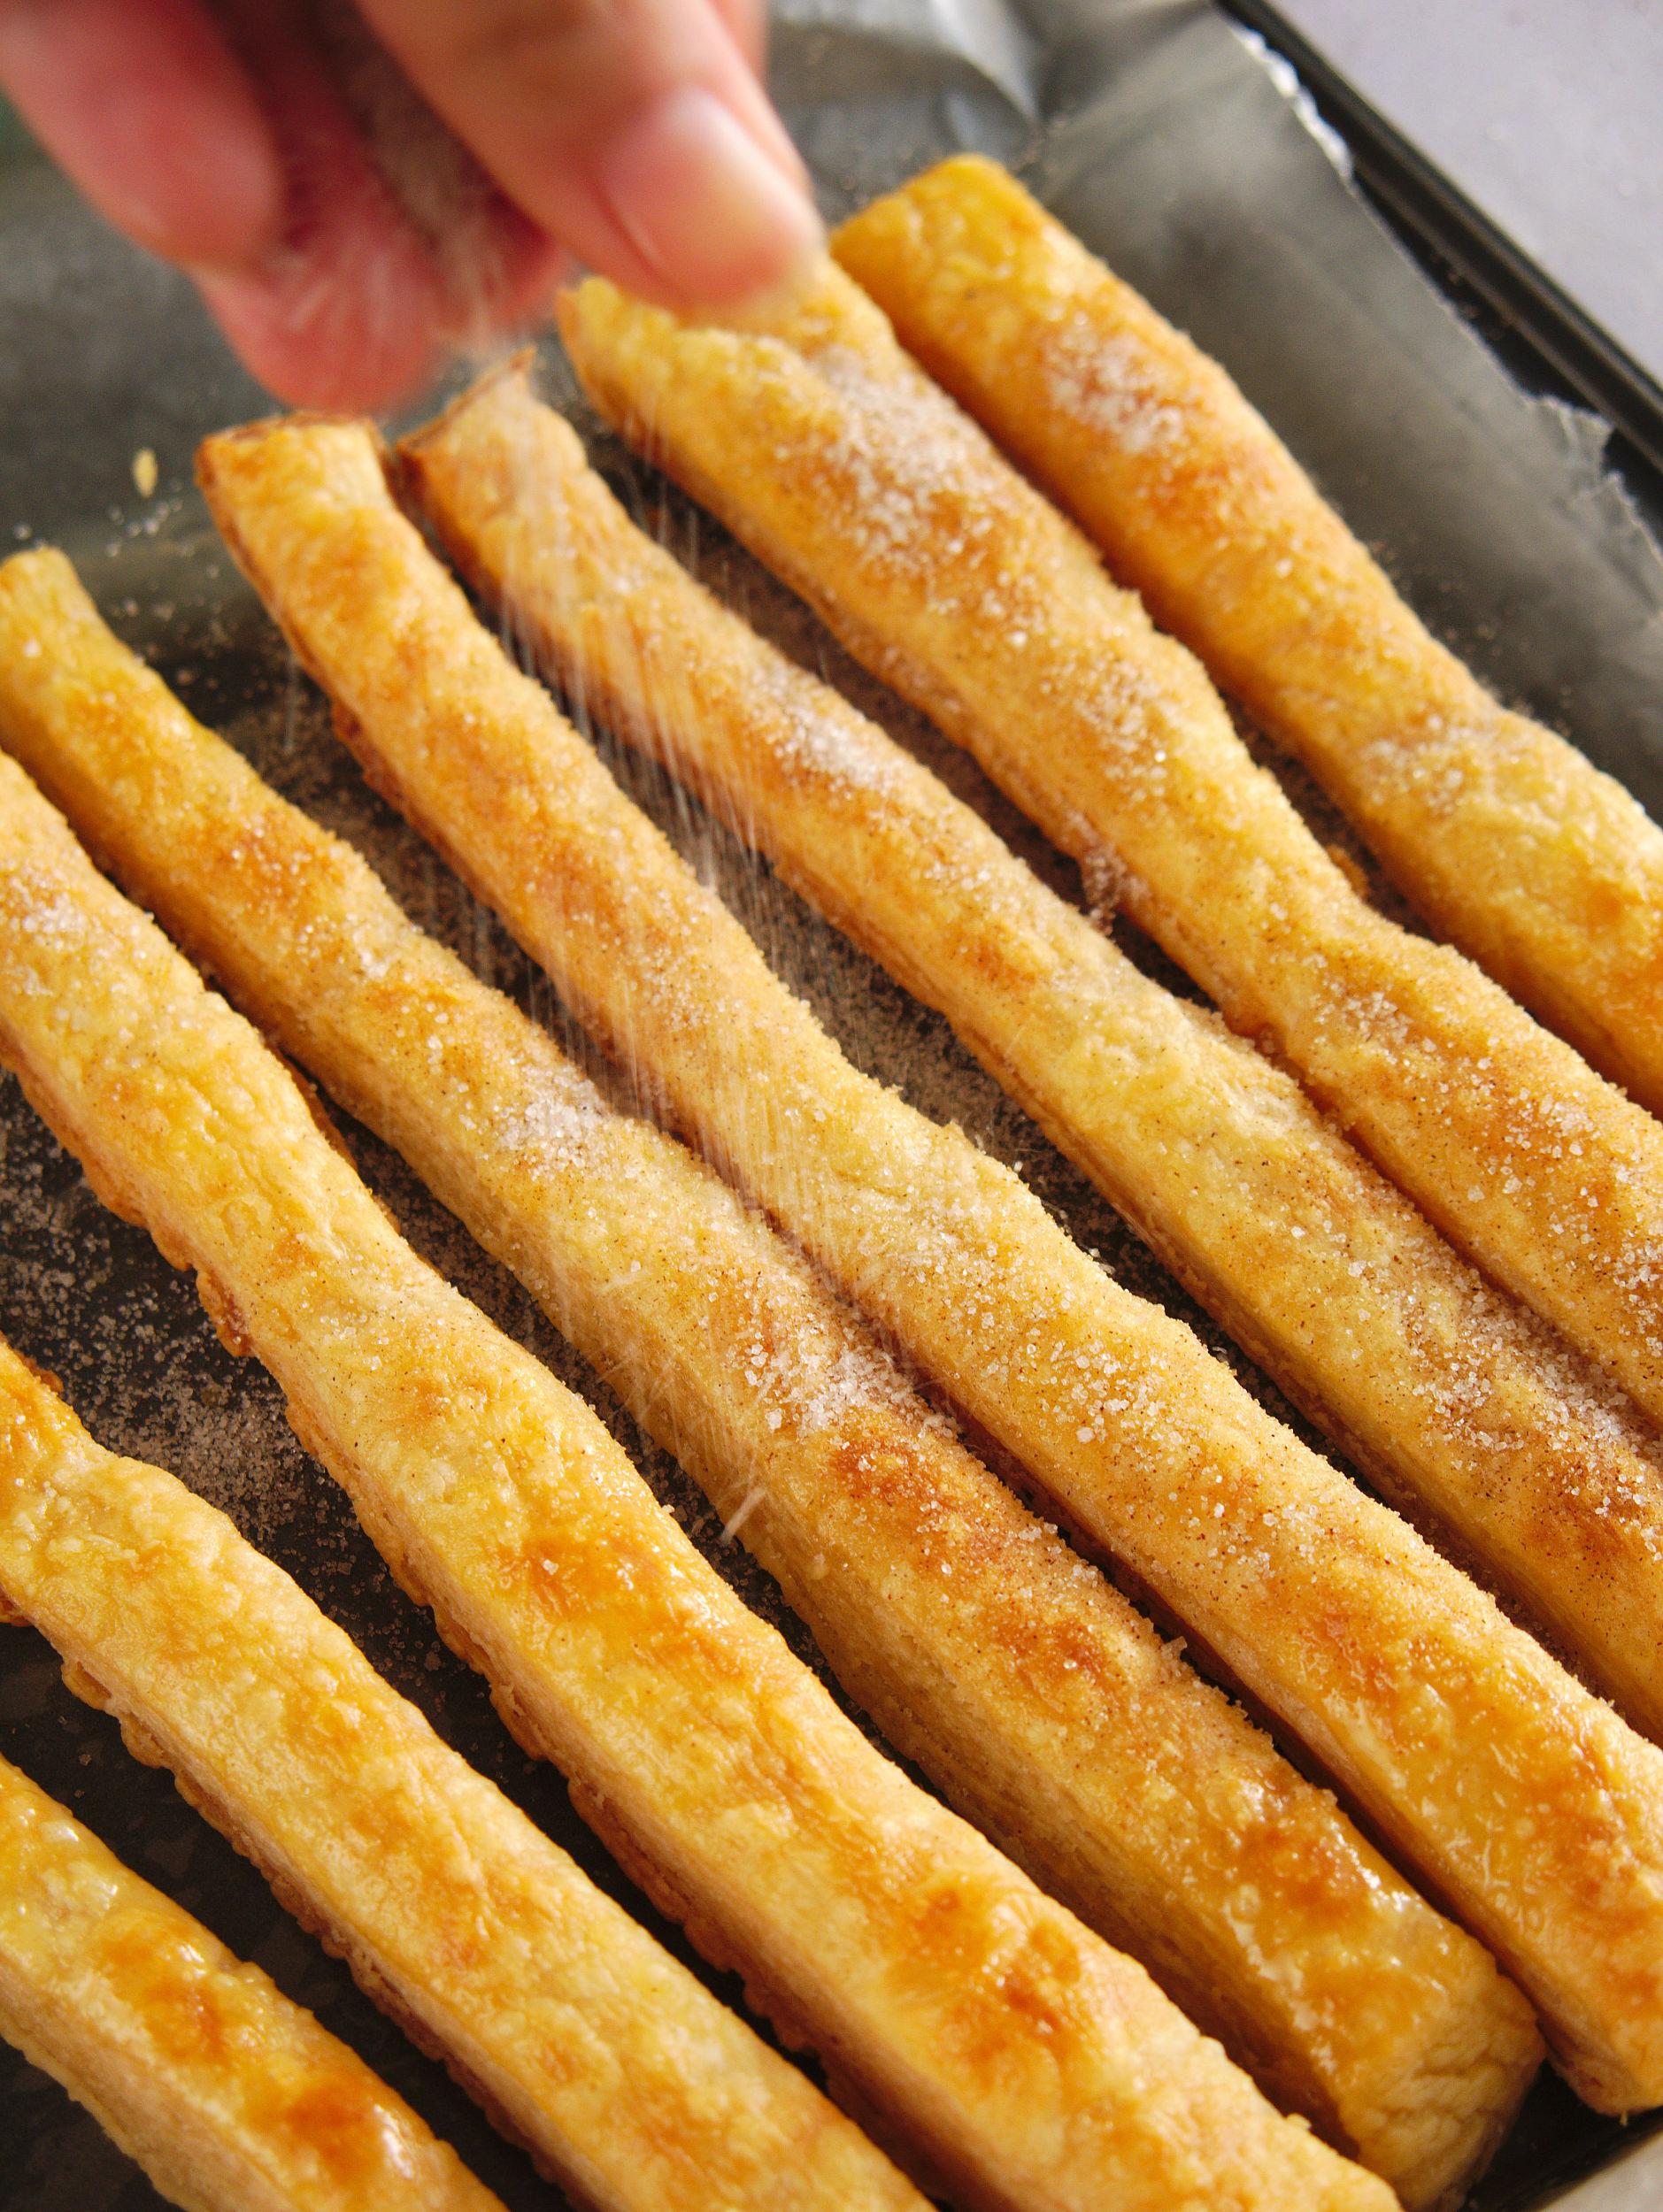 dusting baked churros with cinnamon sugar